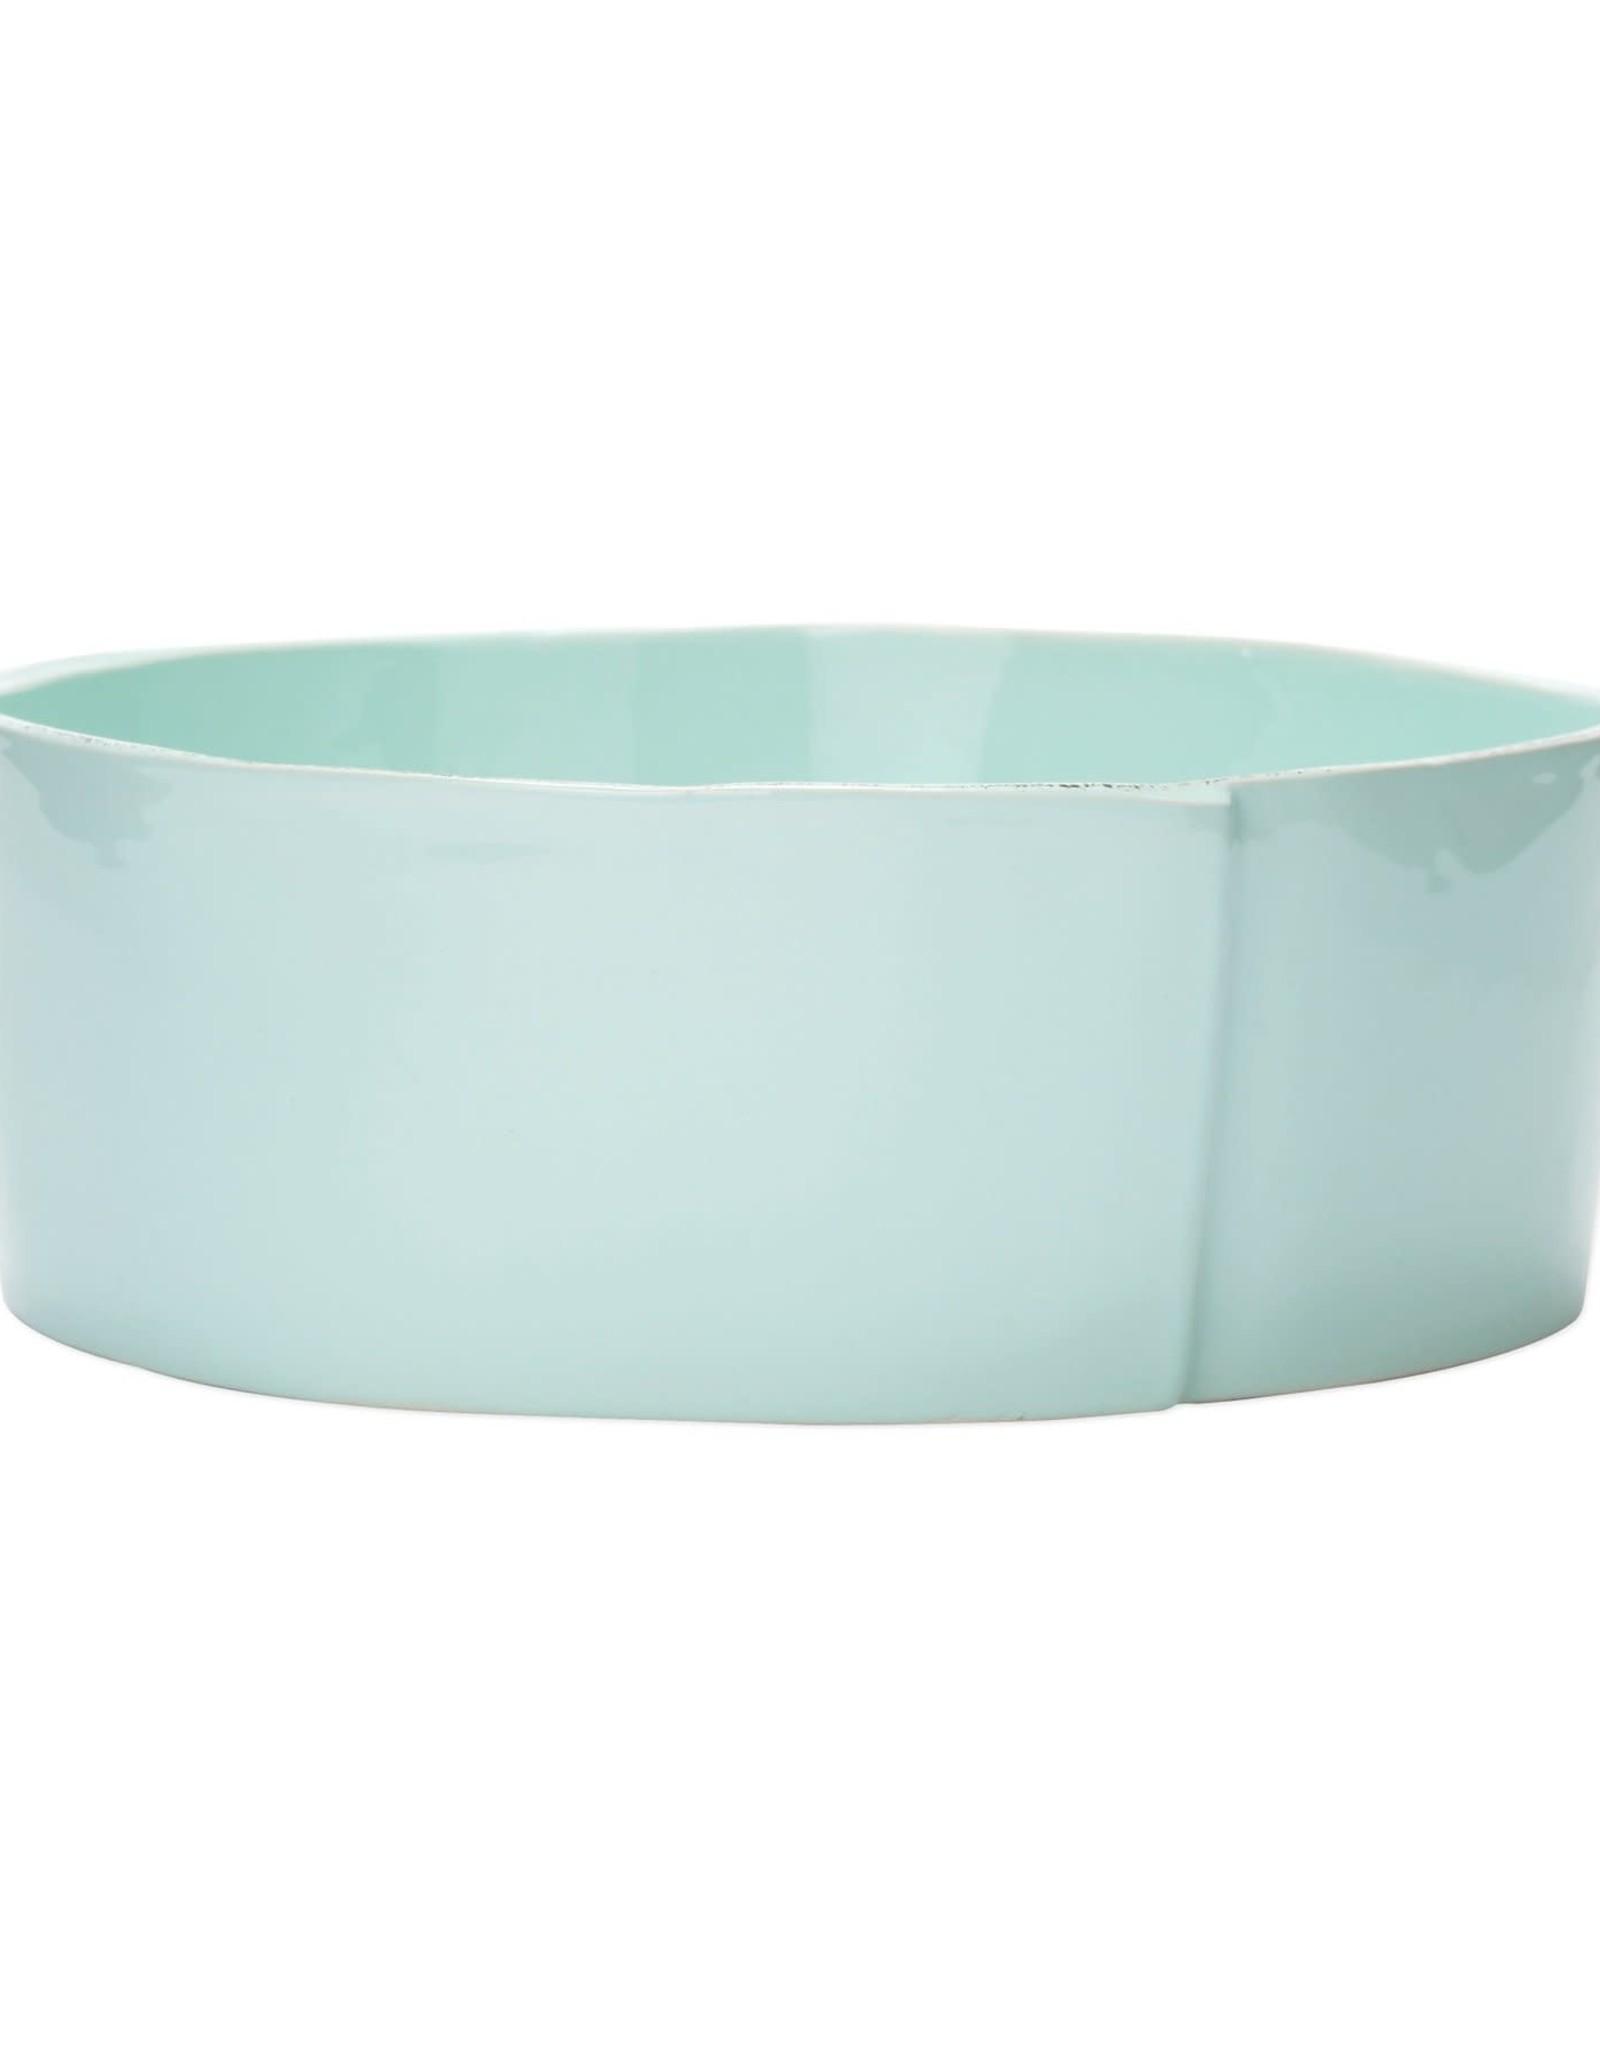 Vietri Lastra Large Serving Bowl Aqua